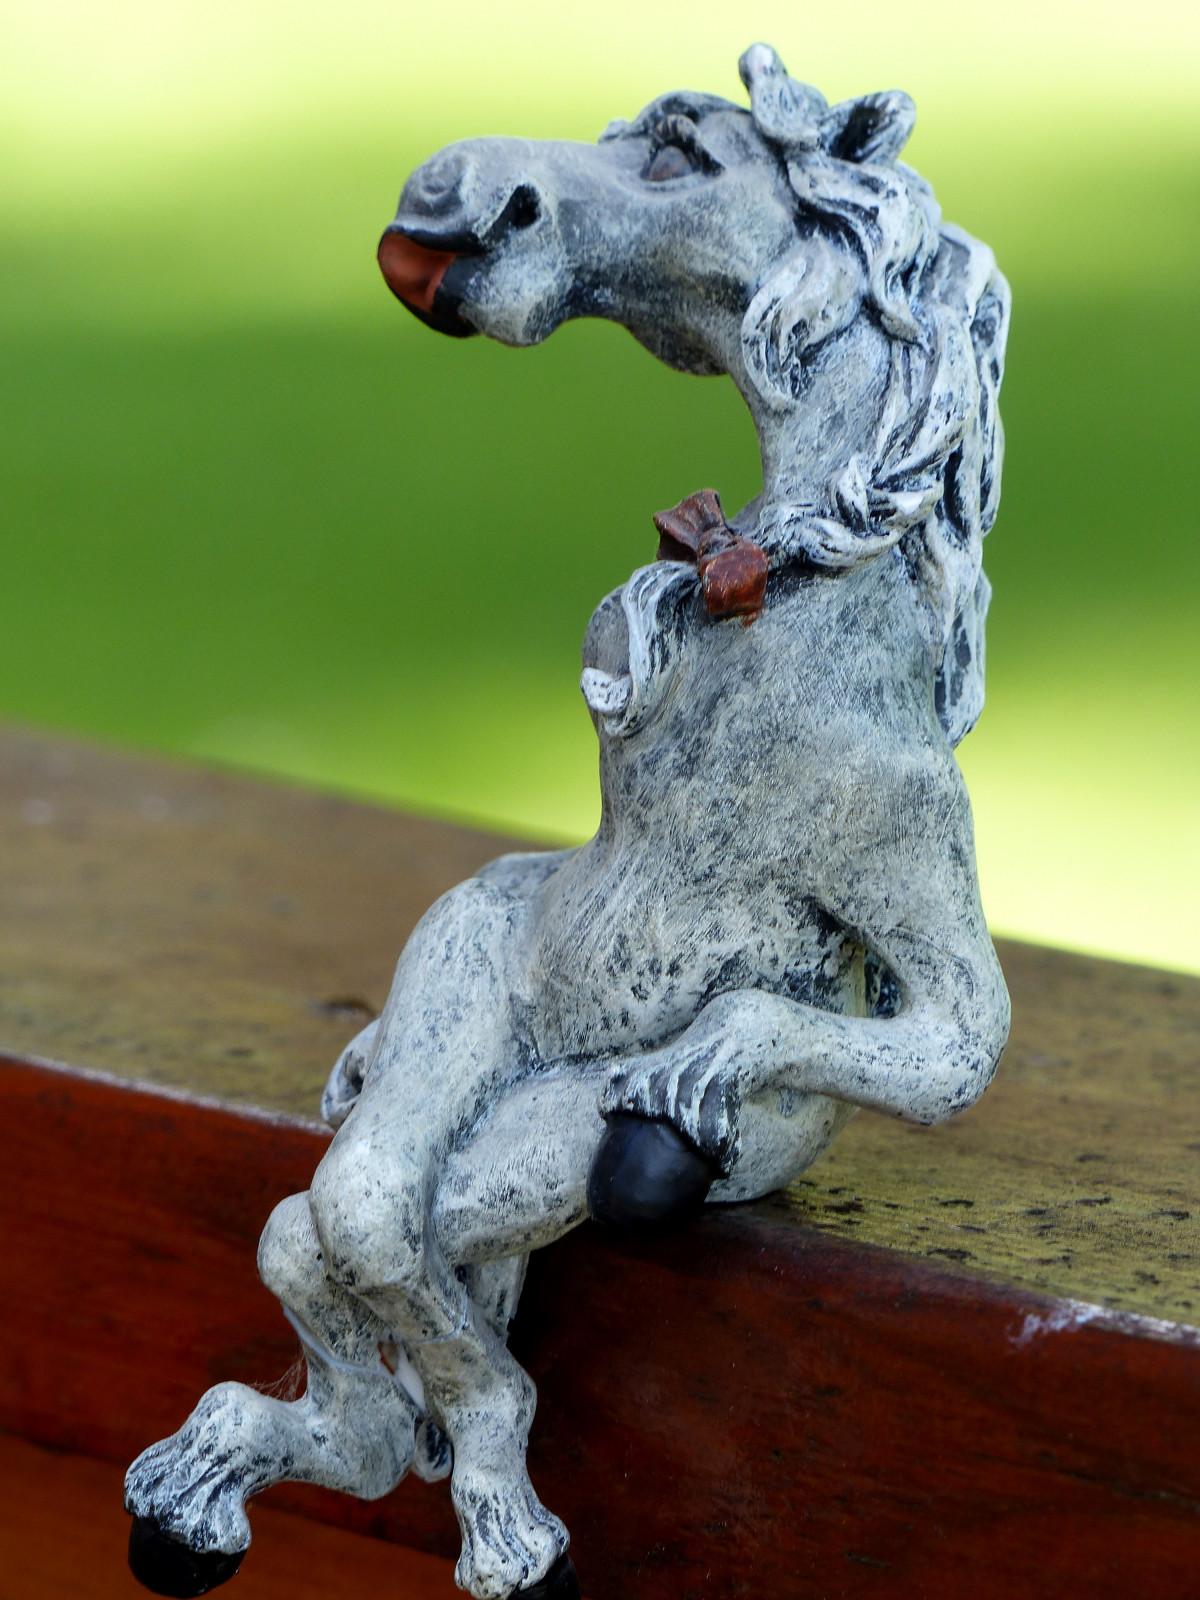 Free Images : Animal, Stone, Statue, Decoration, Stallion ...